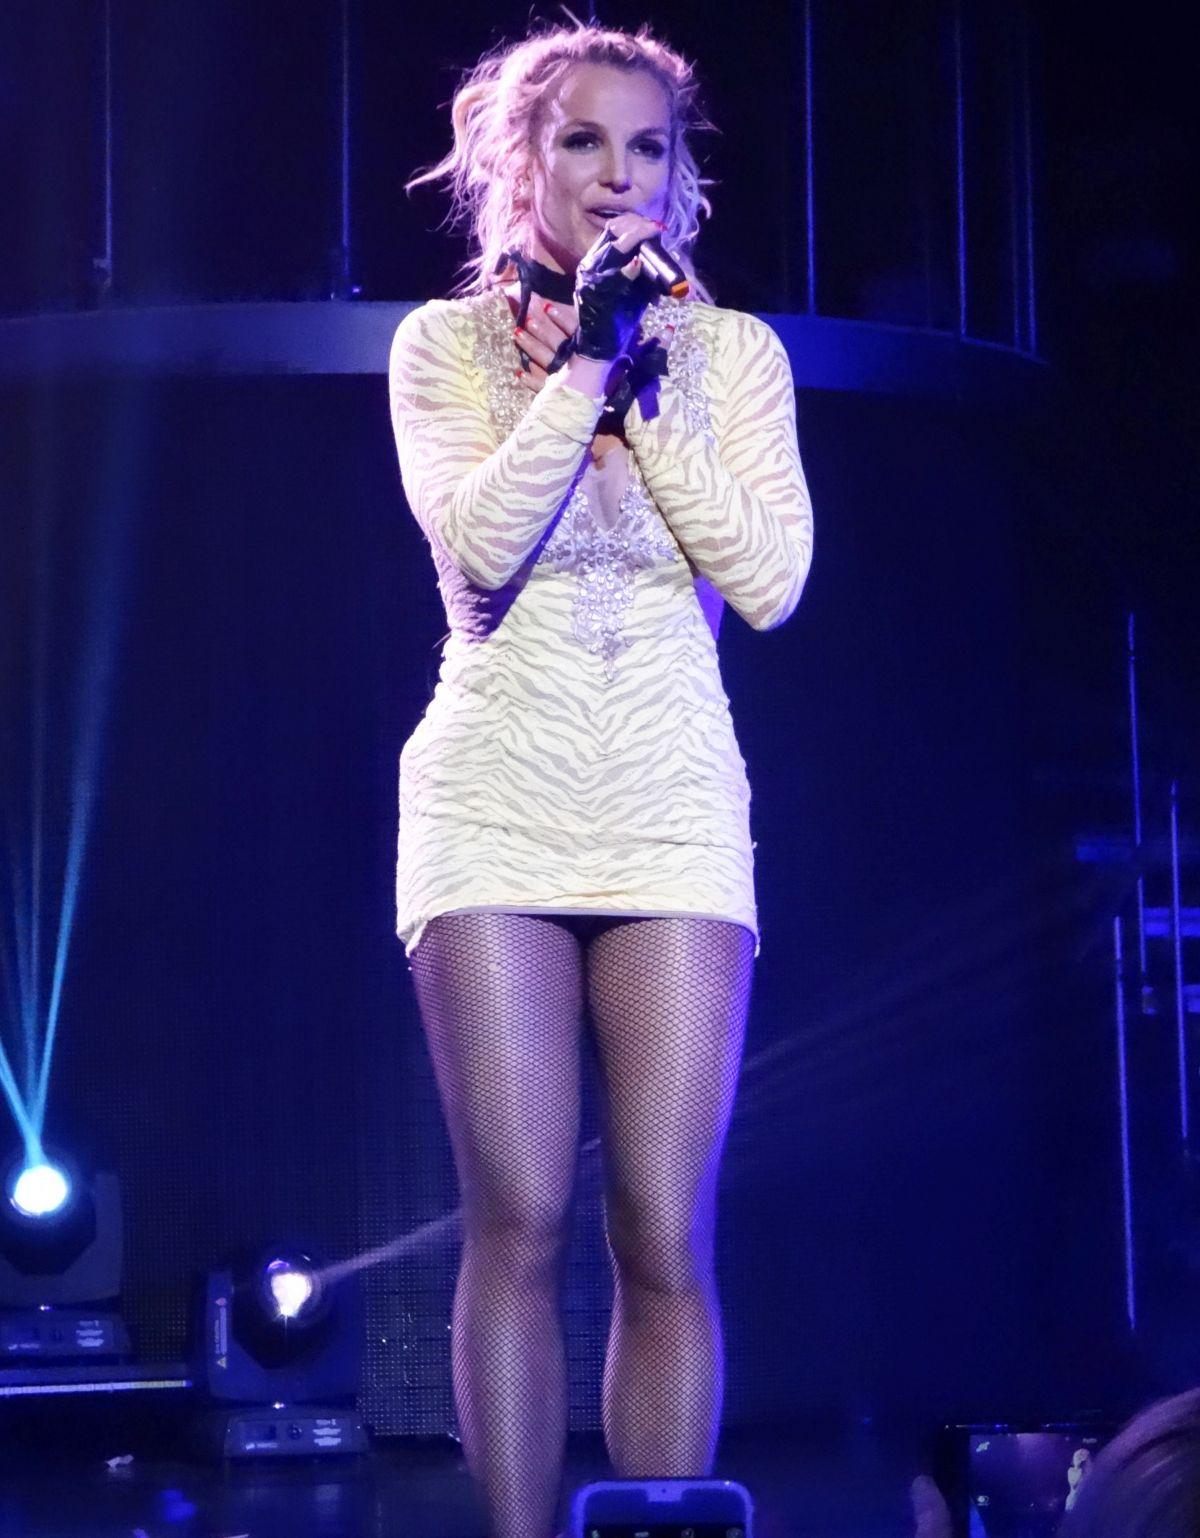 Arts Cross Stitch: Actress, Singer, @ Britney Spears ...